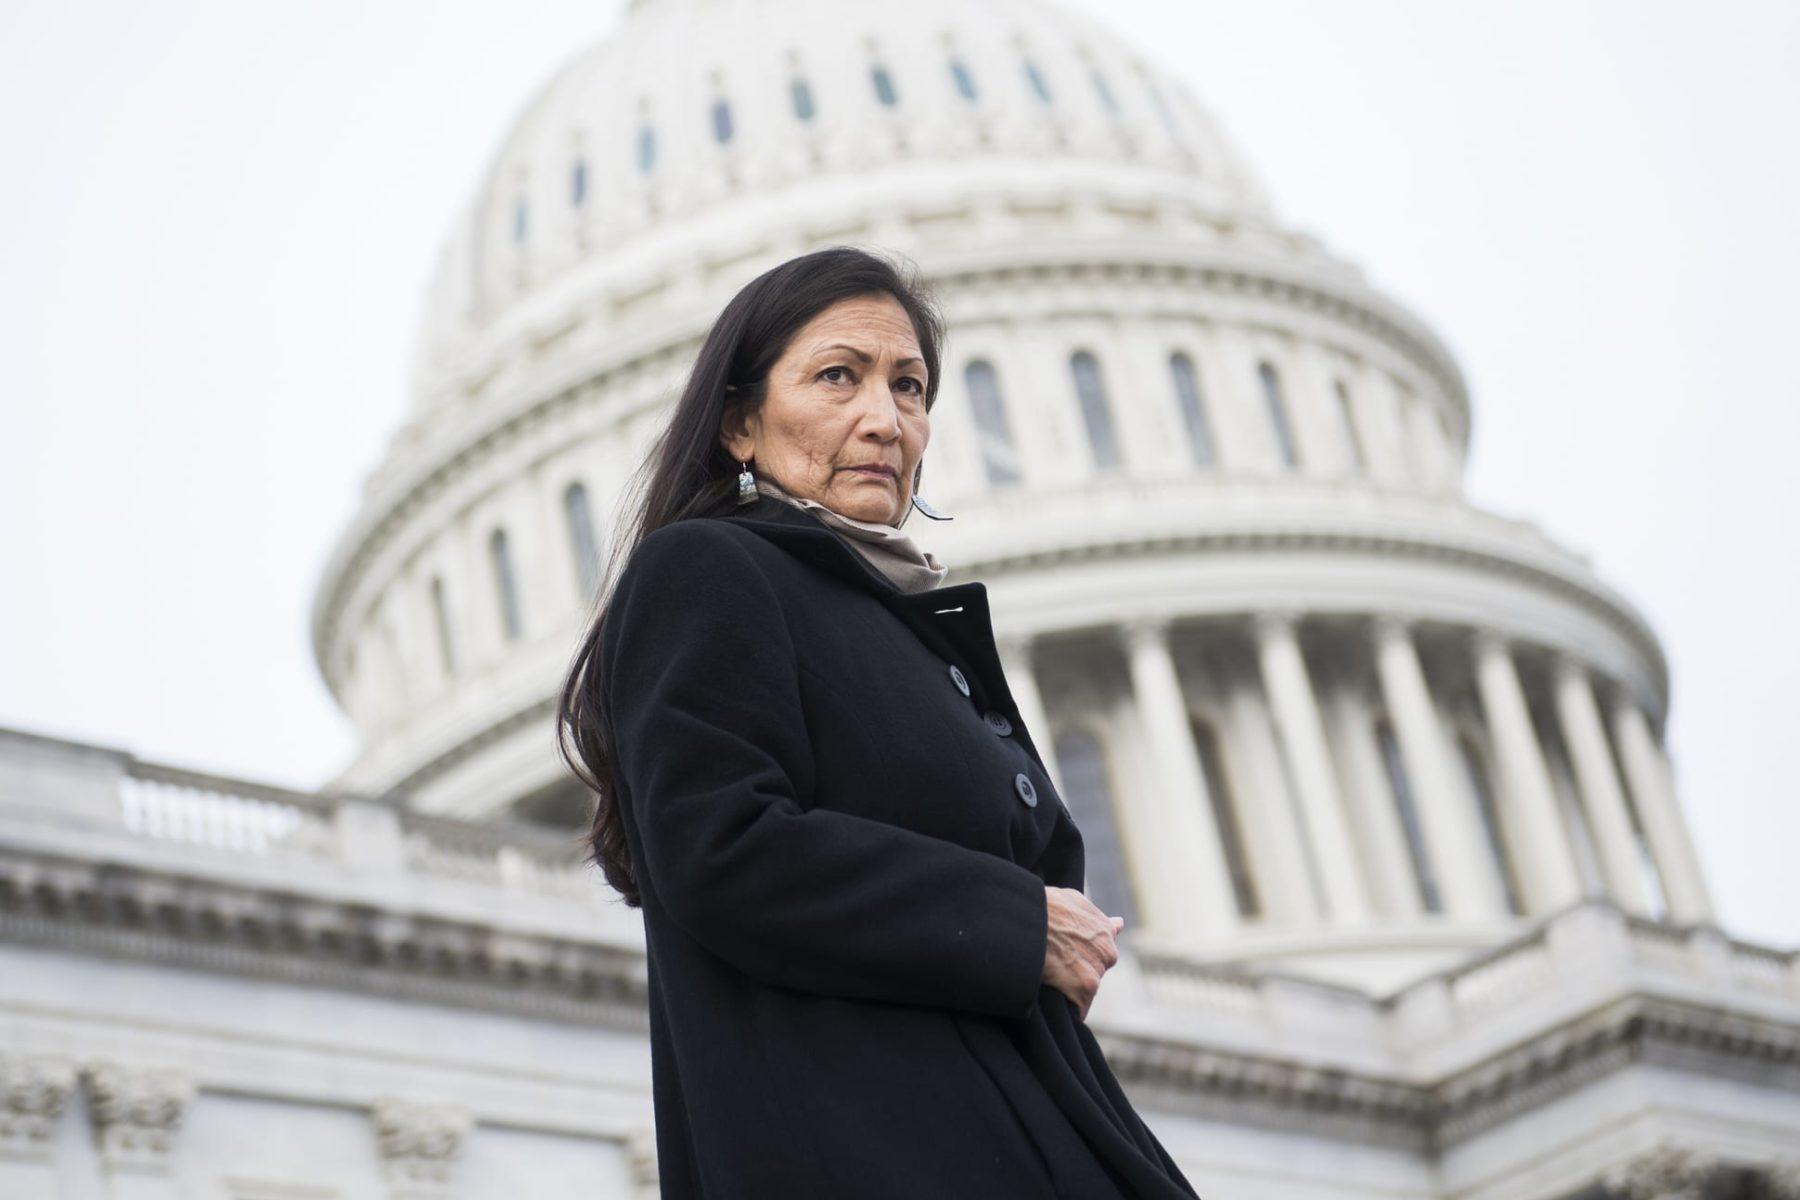 DEb Haaland standing in front of the U.S. Capitol building.